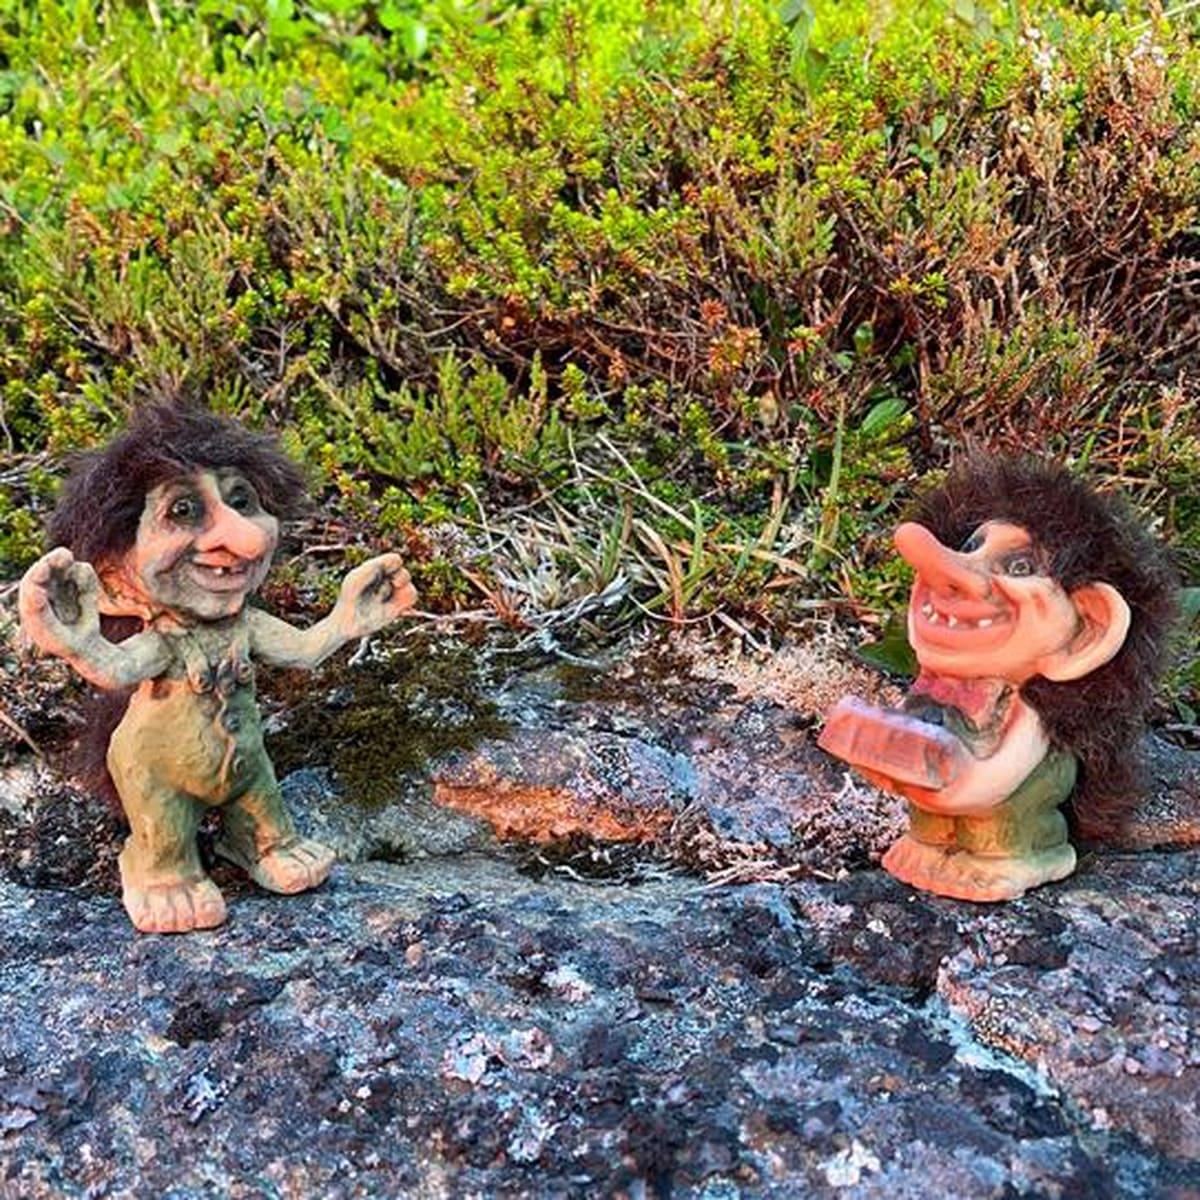 Troll with cake (Troll # 224)